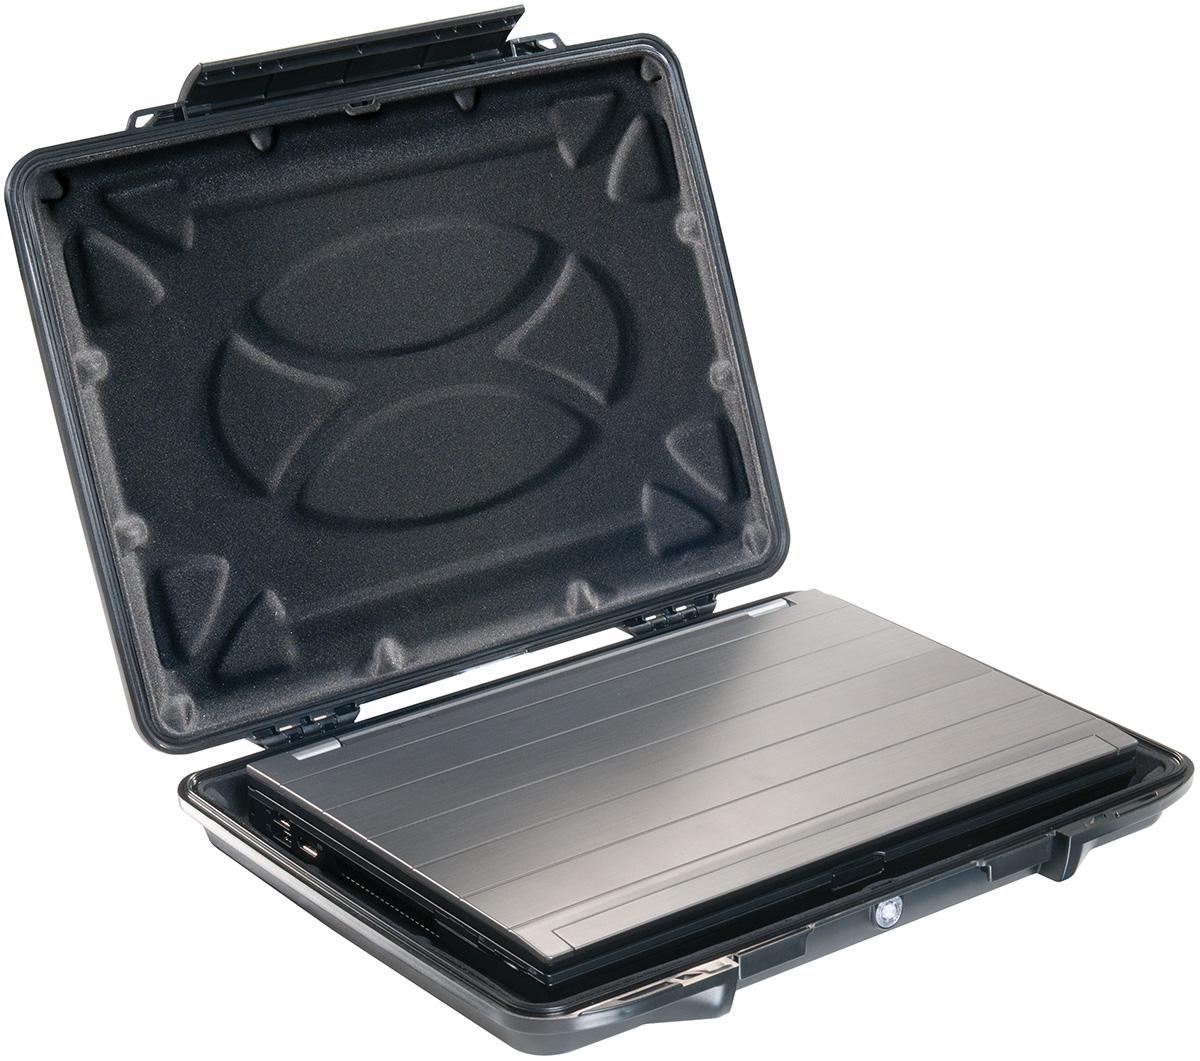 pelican usa made laptop protection case